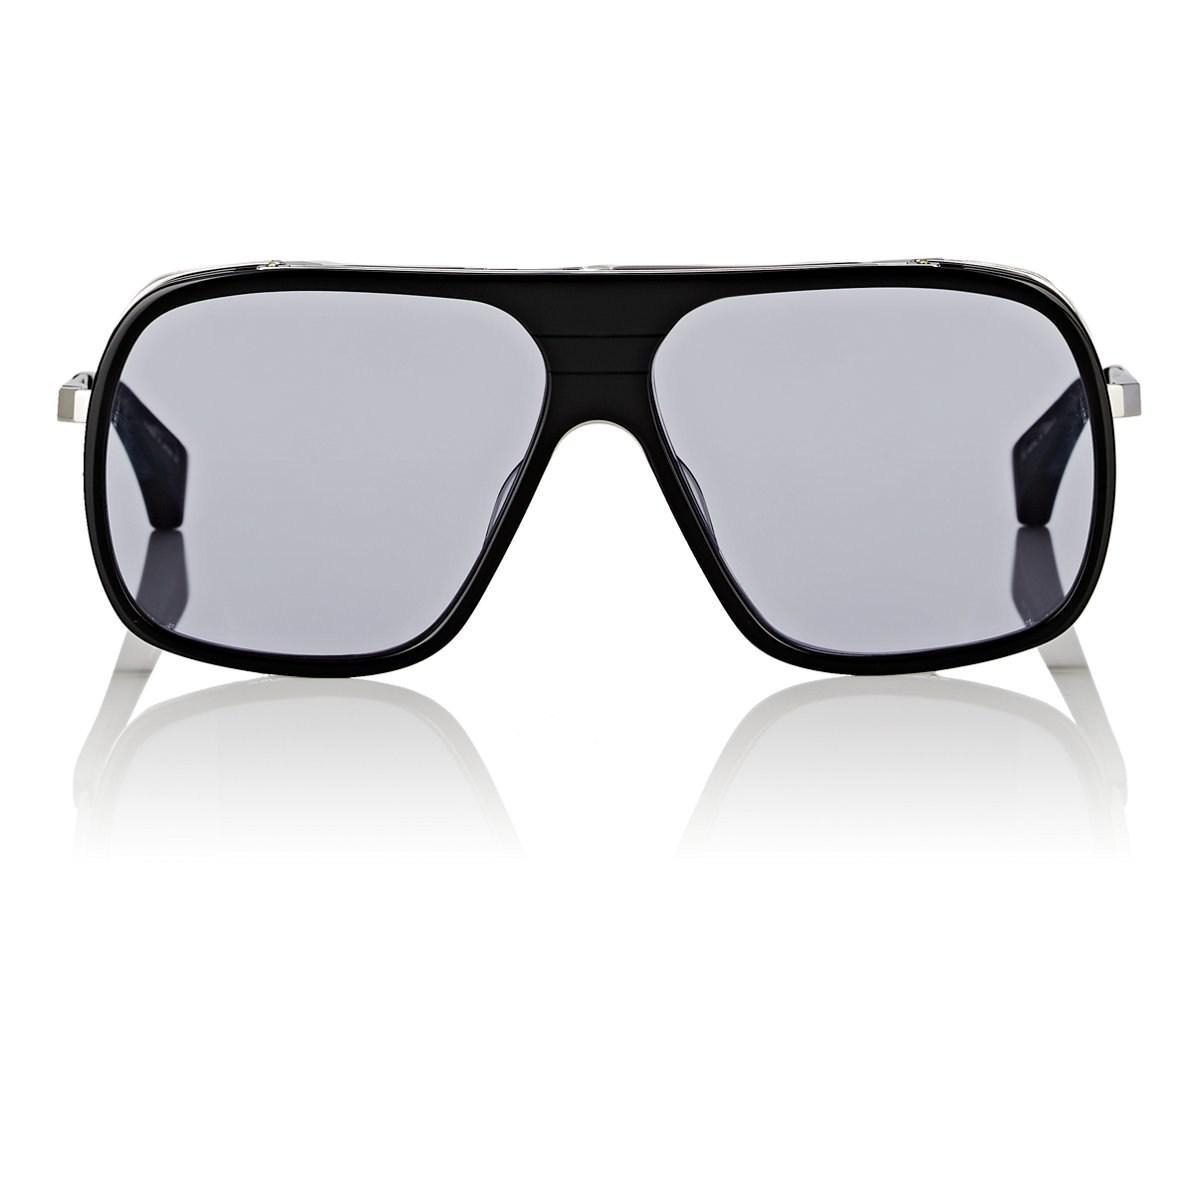 184c3d55f1c Lyst - DITA Endurance 79 Sunglasses in Black for Men